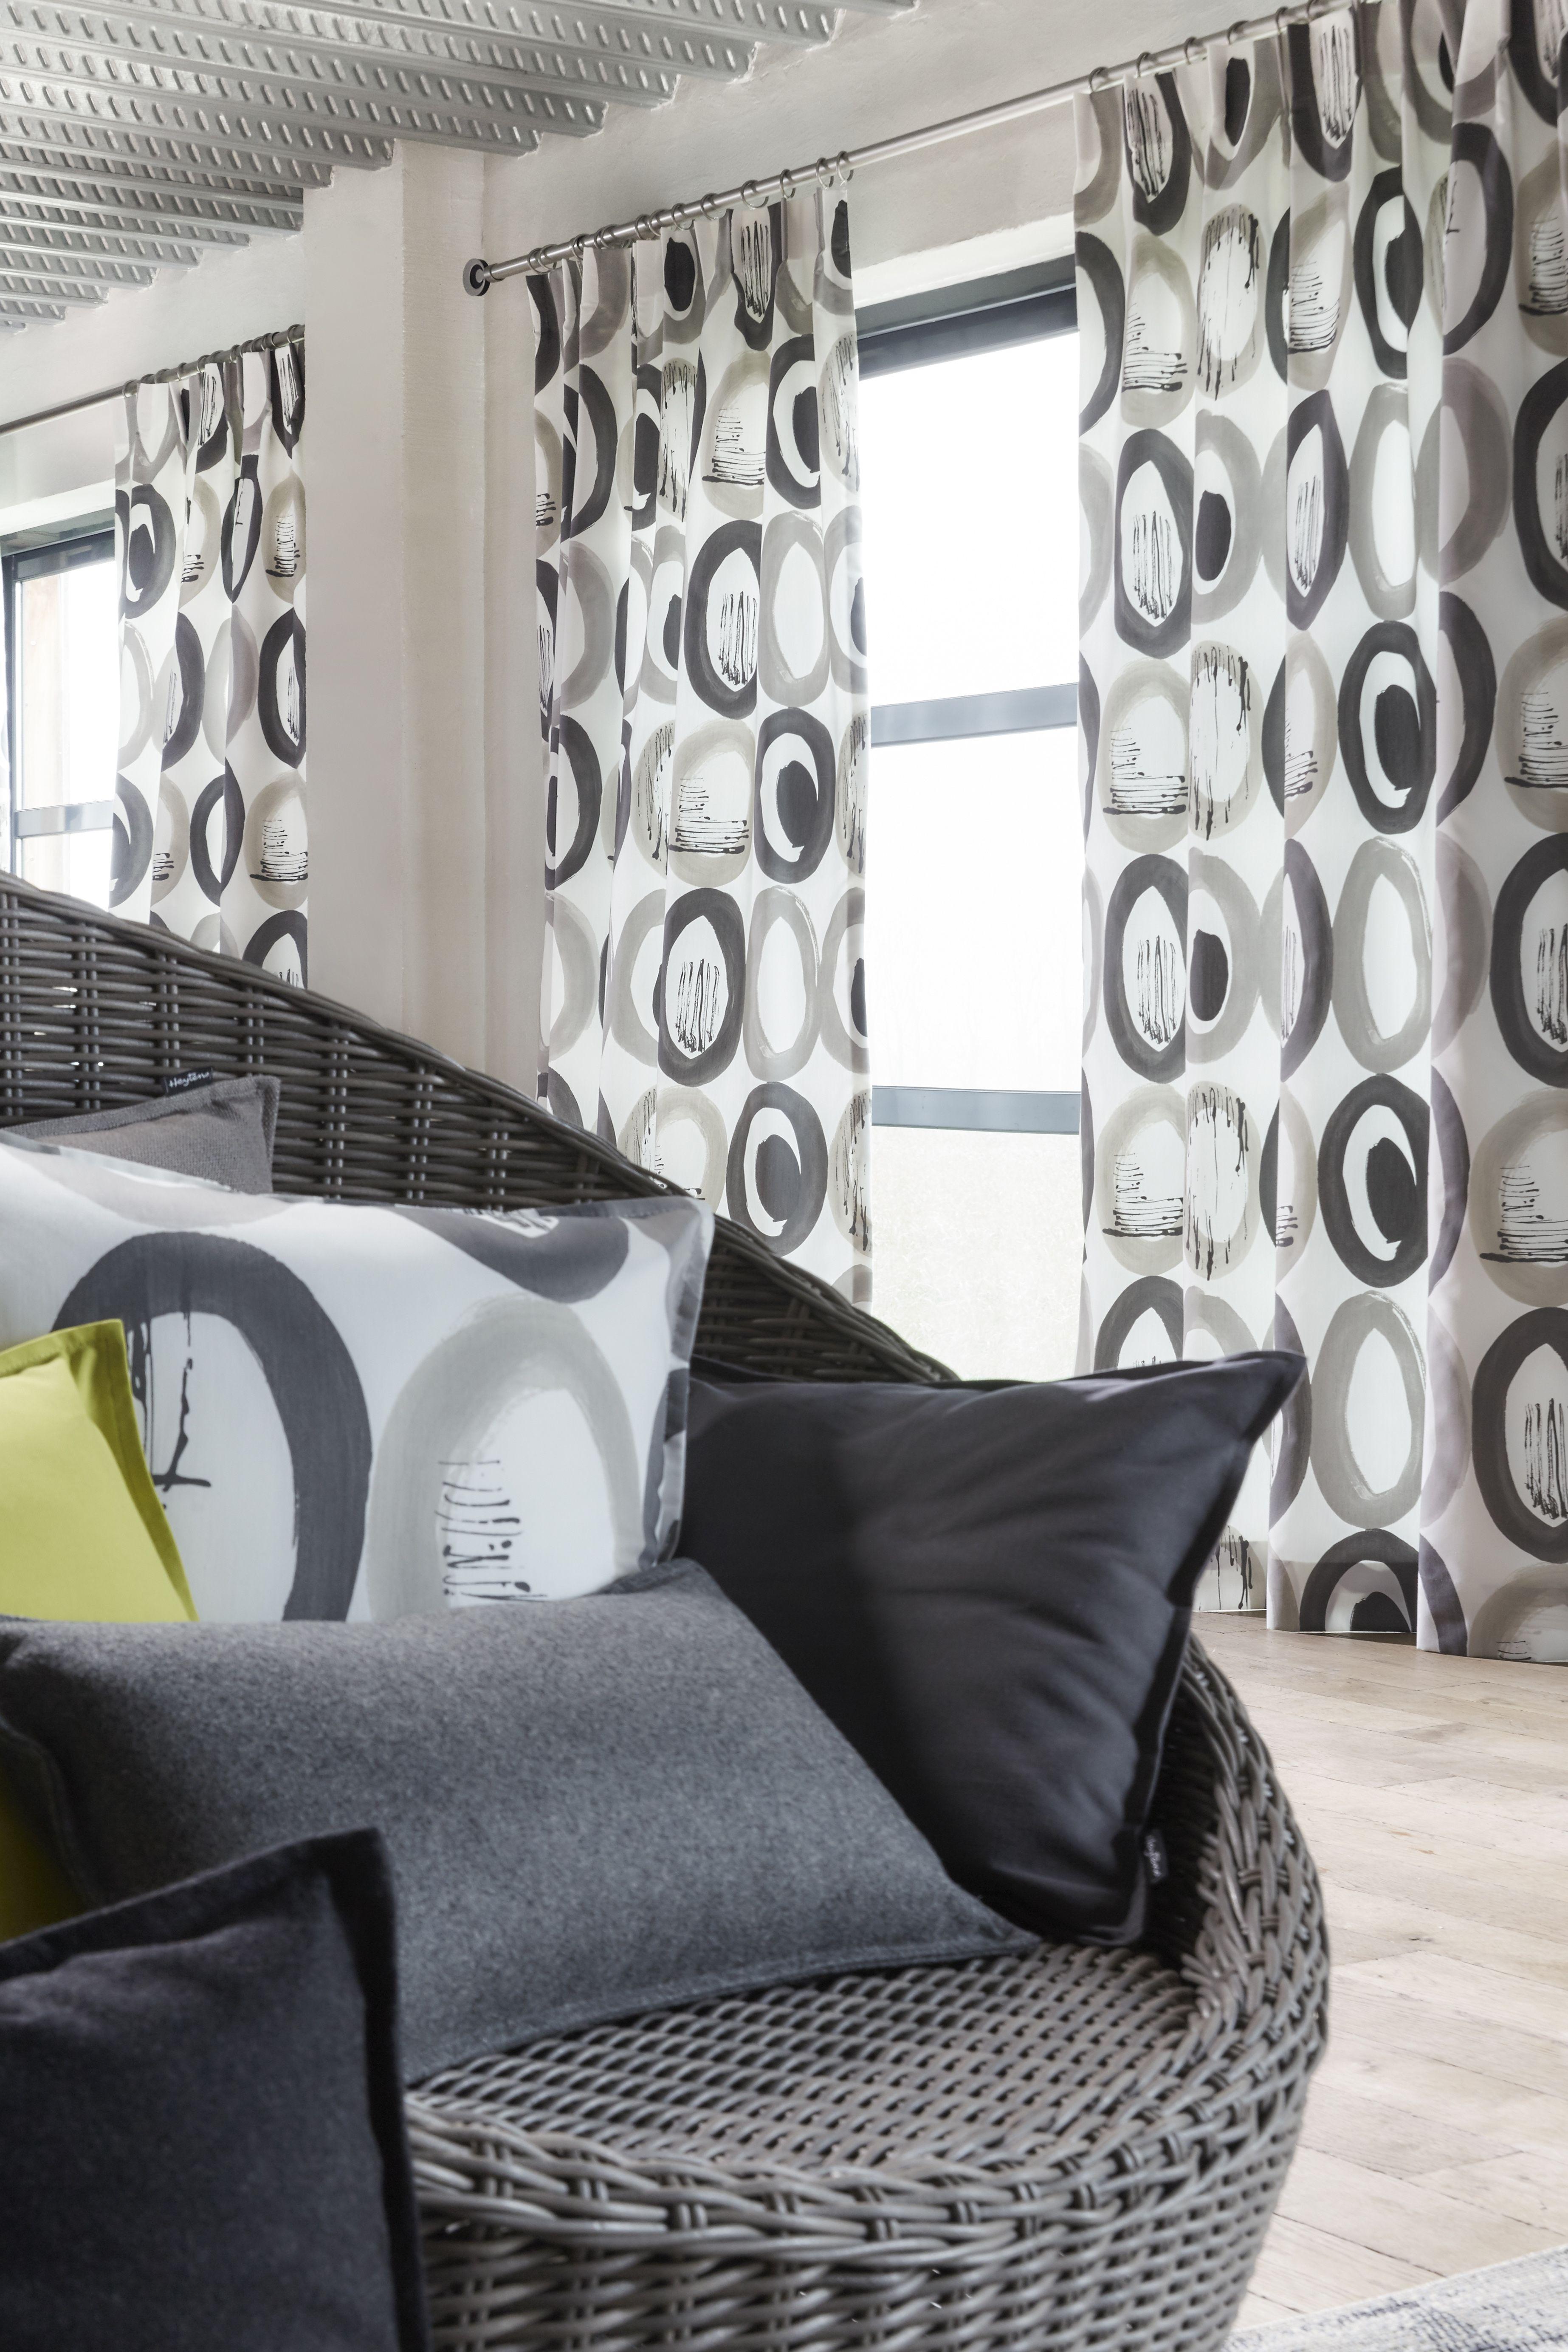 ambiance tissu ellipse gris collection heytens 2014. Black Bedroom Furniture Sets. Home Design Ideas